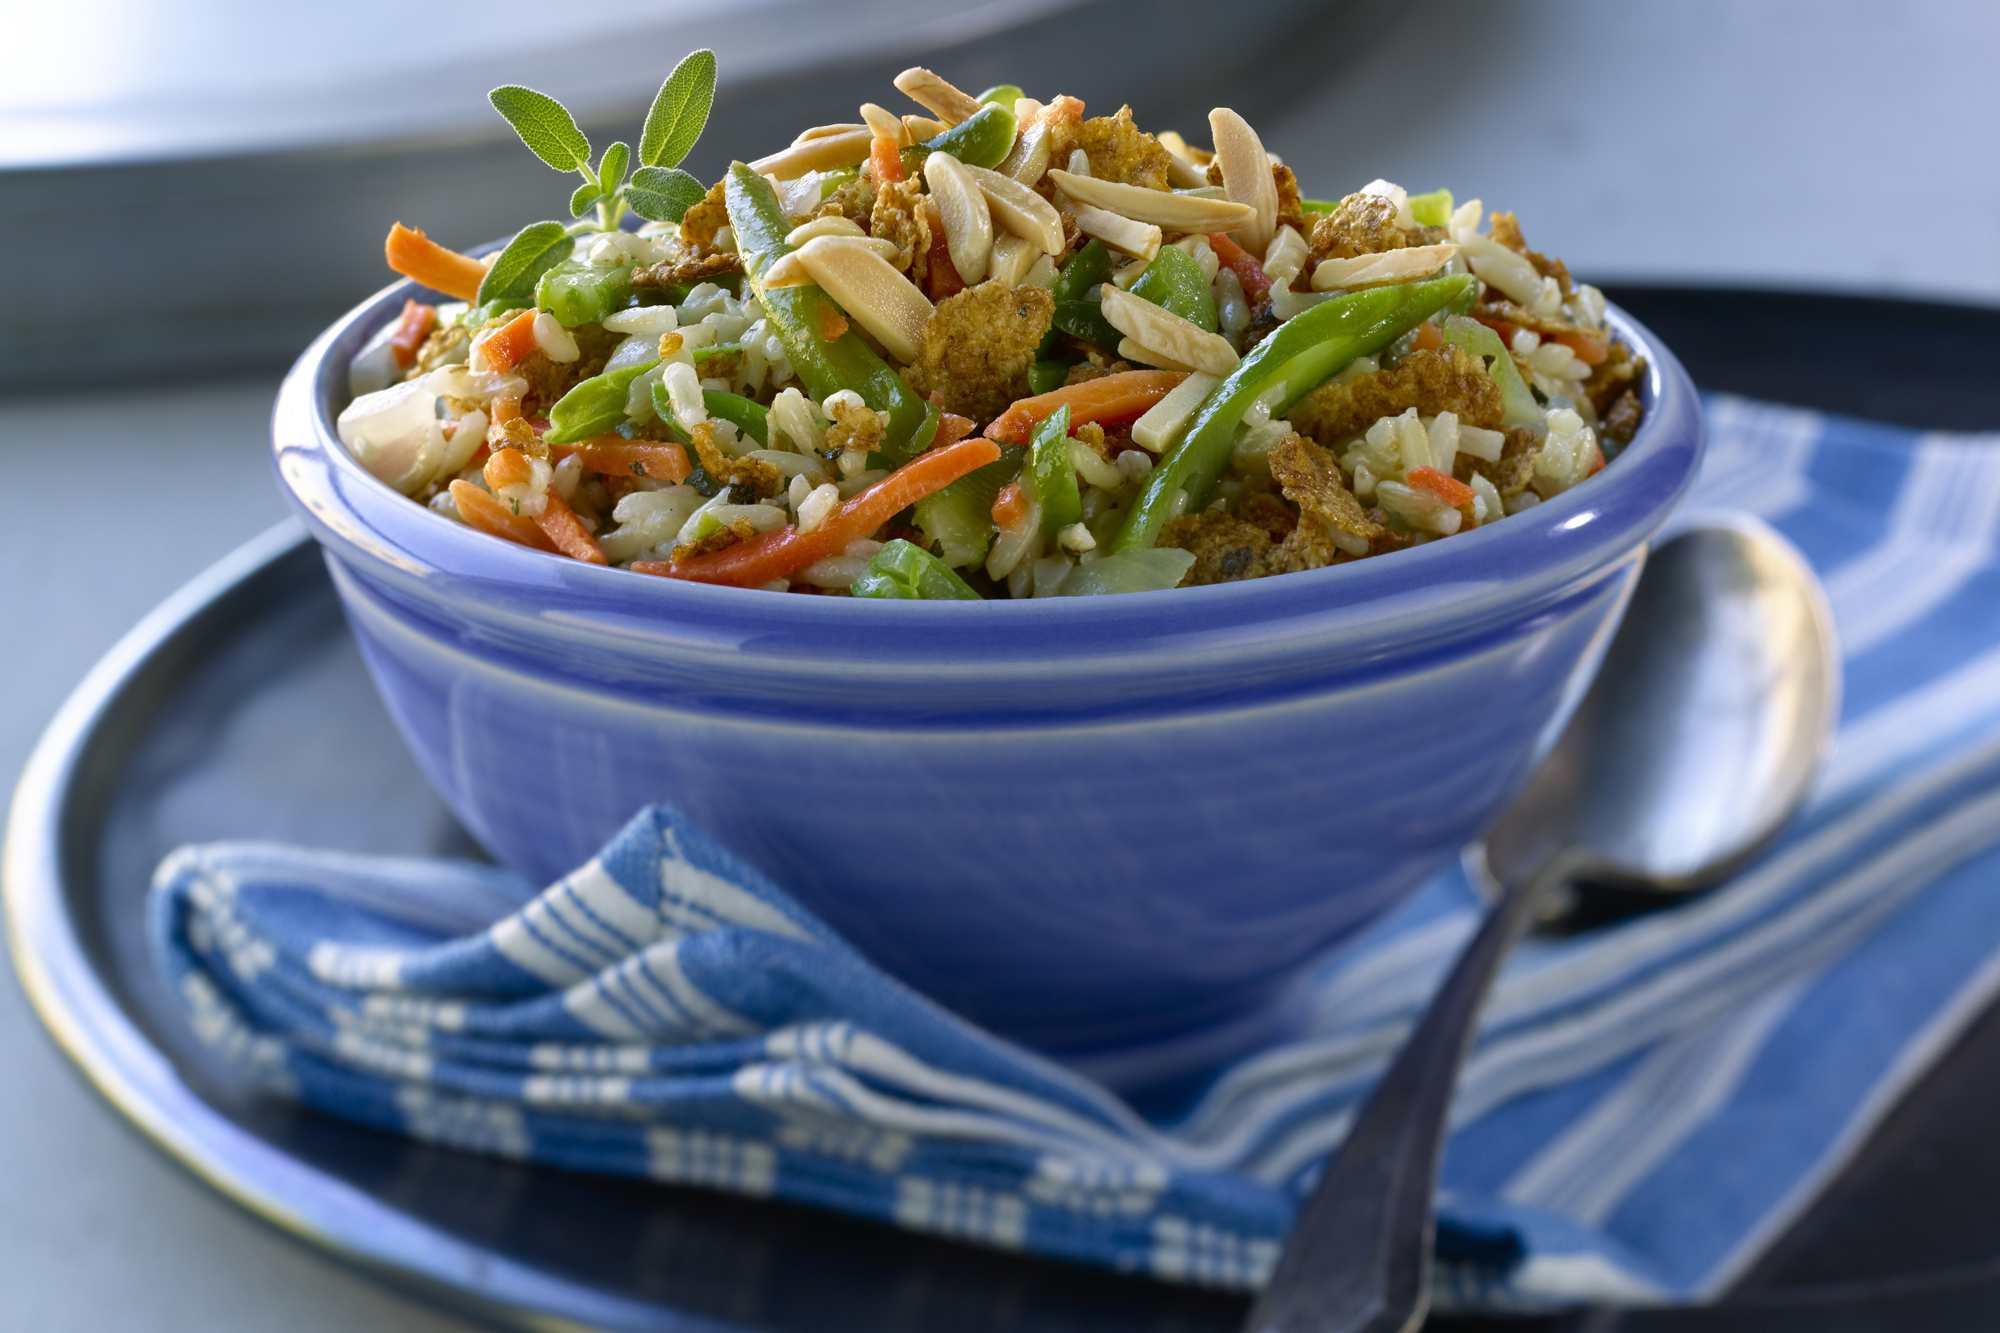 Colorful Rice Salad With Lemon Dressing